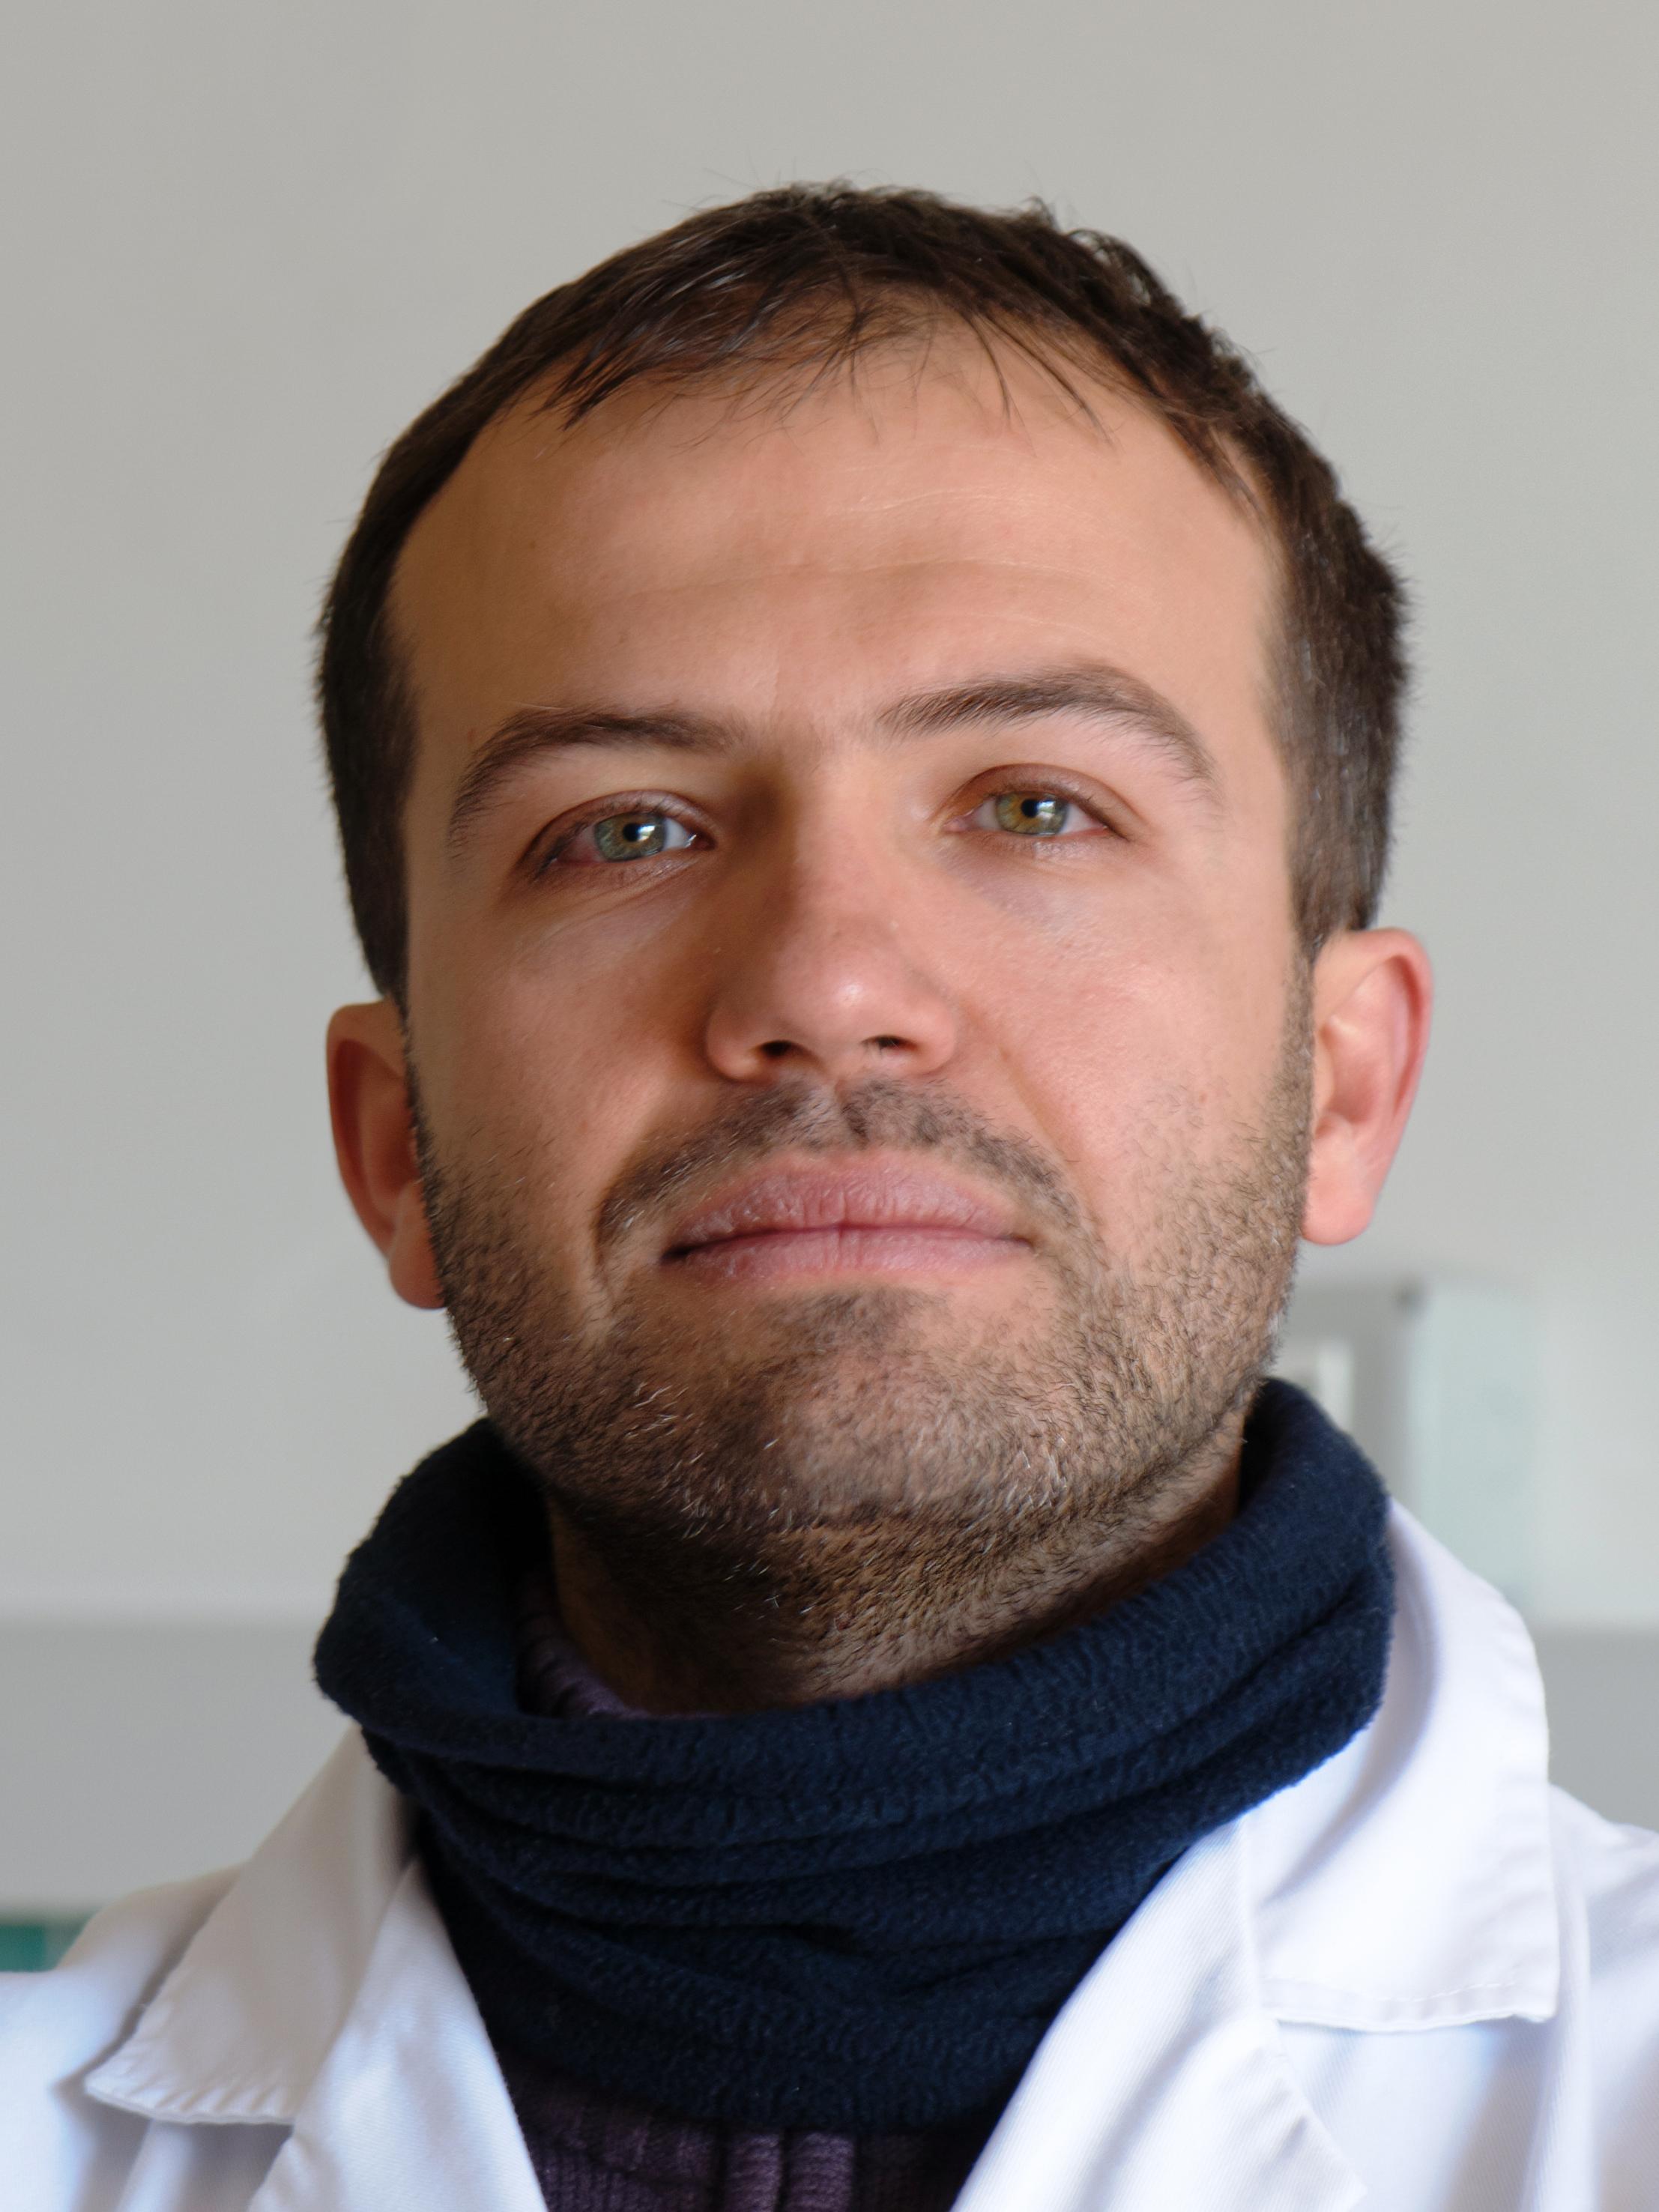 Alessandro Mazzotta